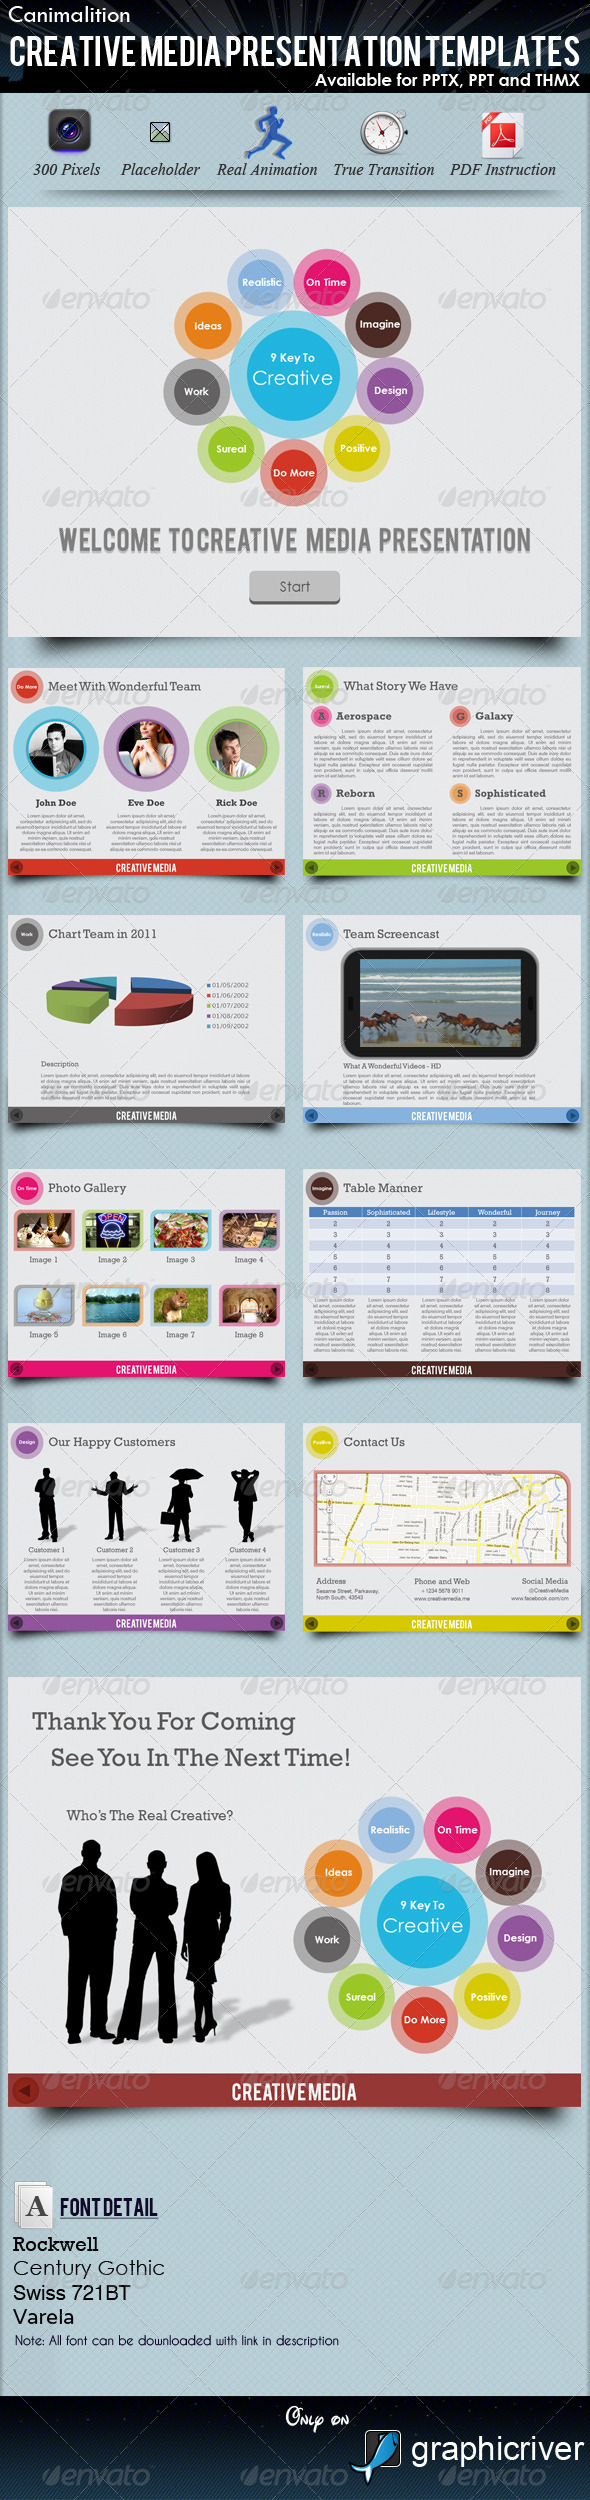 GraphicRiver Creative Media Presentation Templates 556668